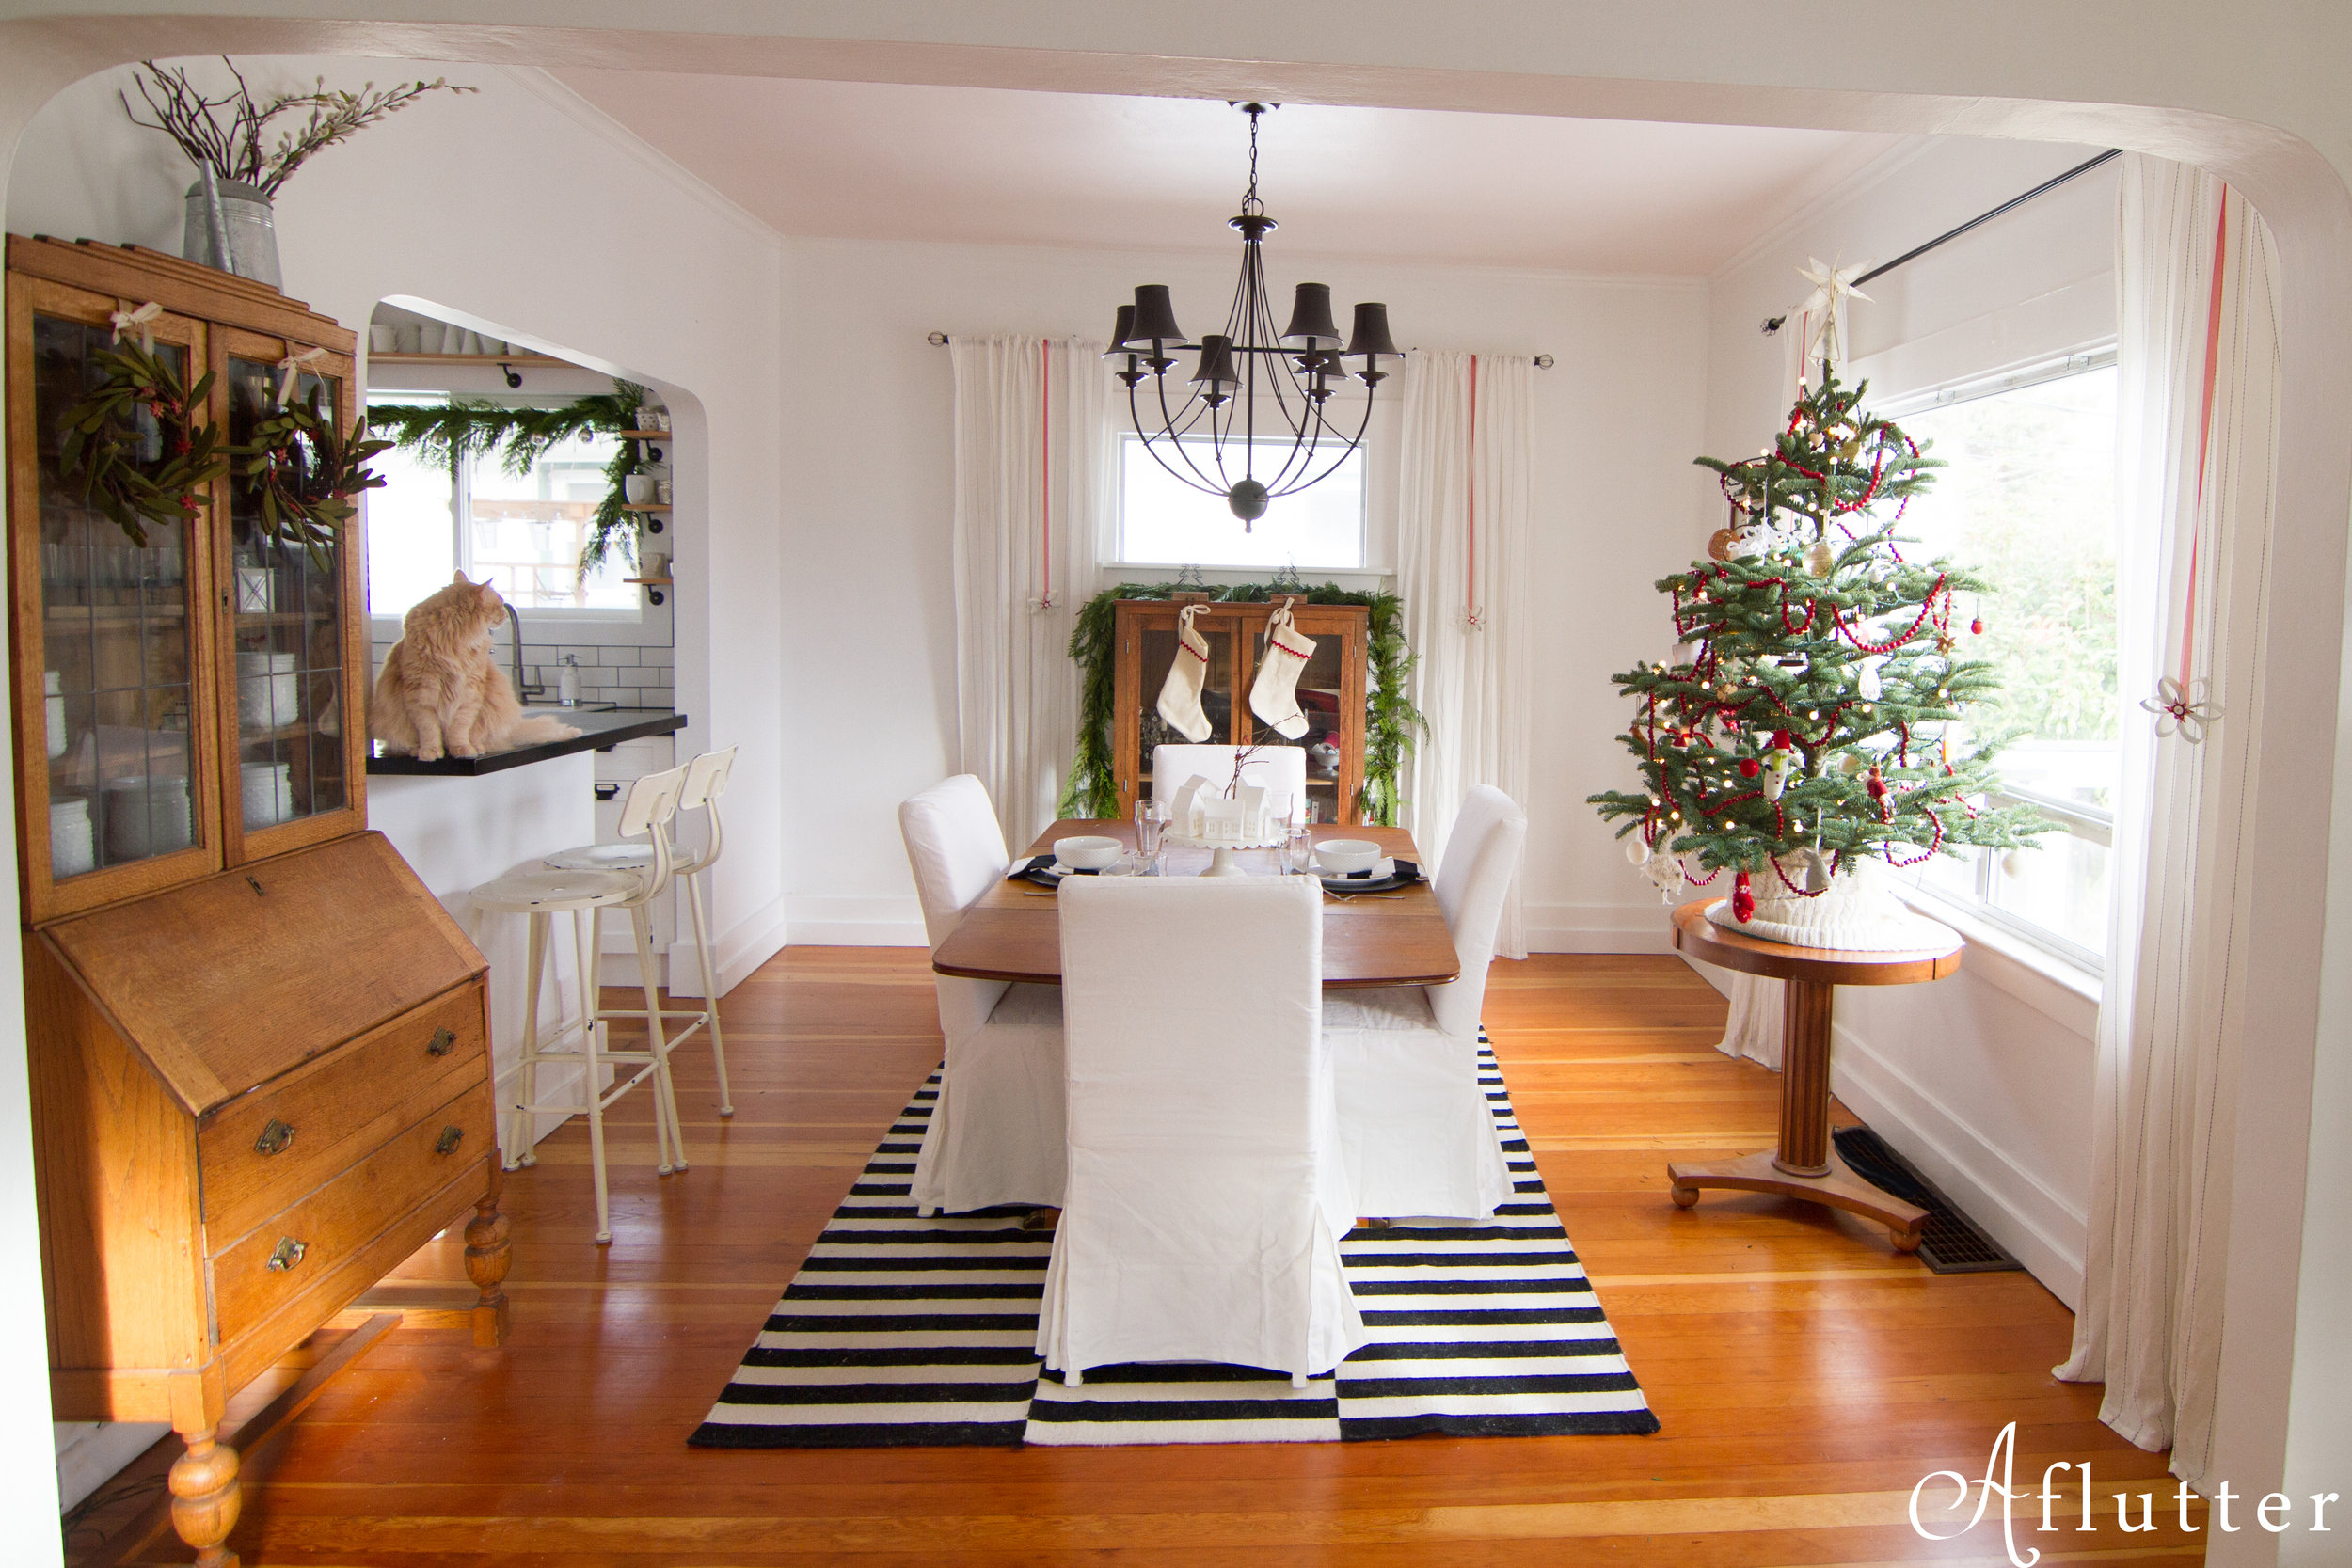 Christmas-Kitchen-Reveal-15-of-20.jpg